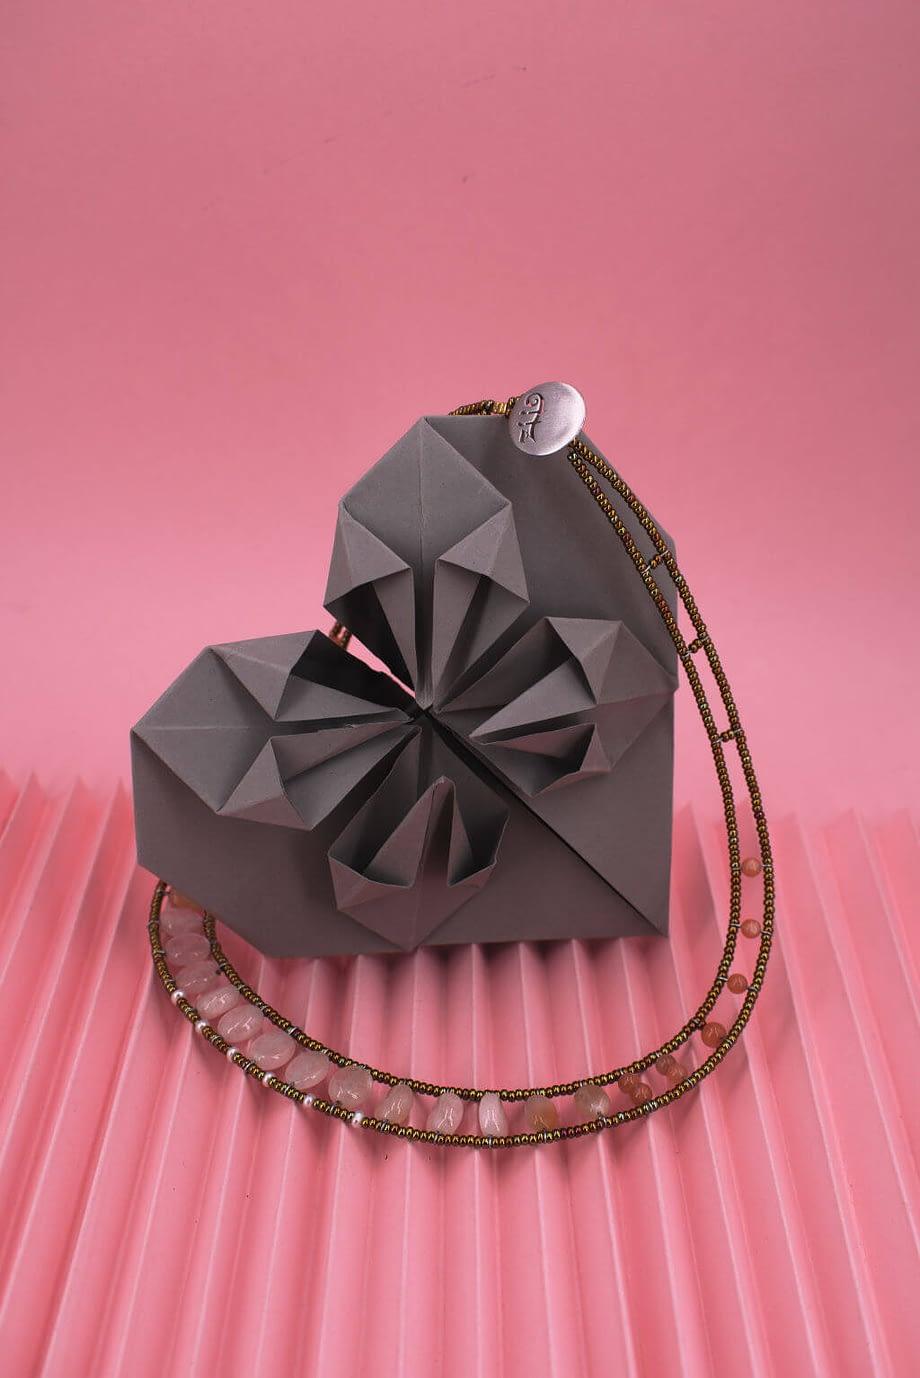 ziio-jewels-necklace-giro-morganite-1024x1534-2-c